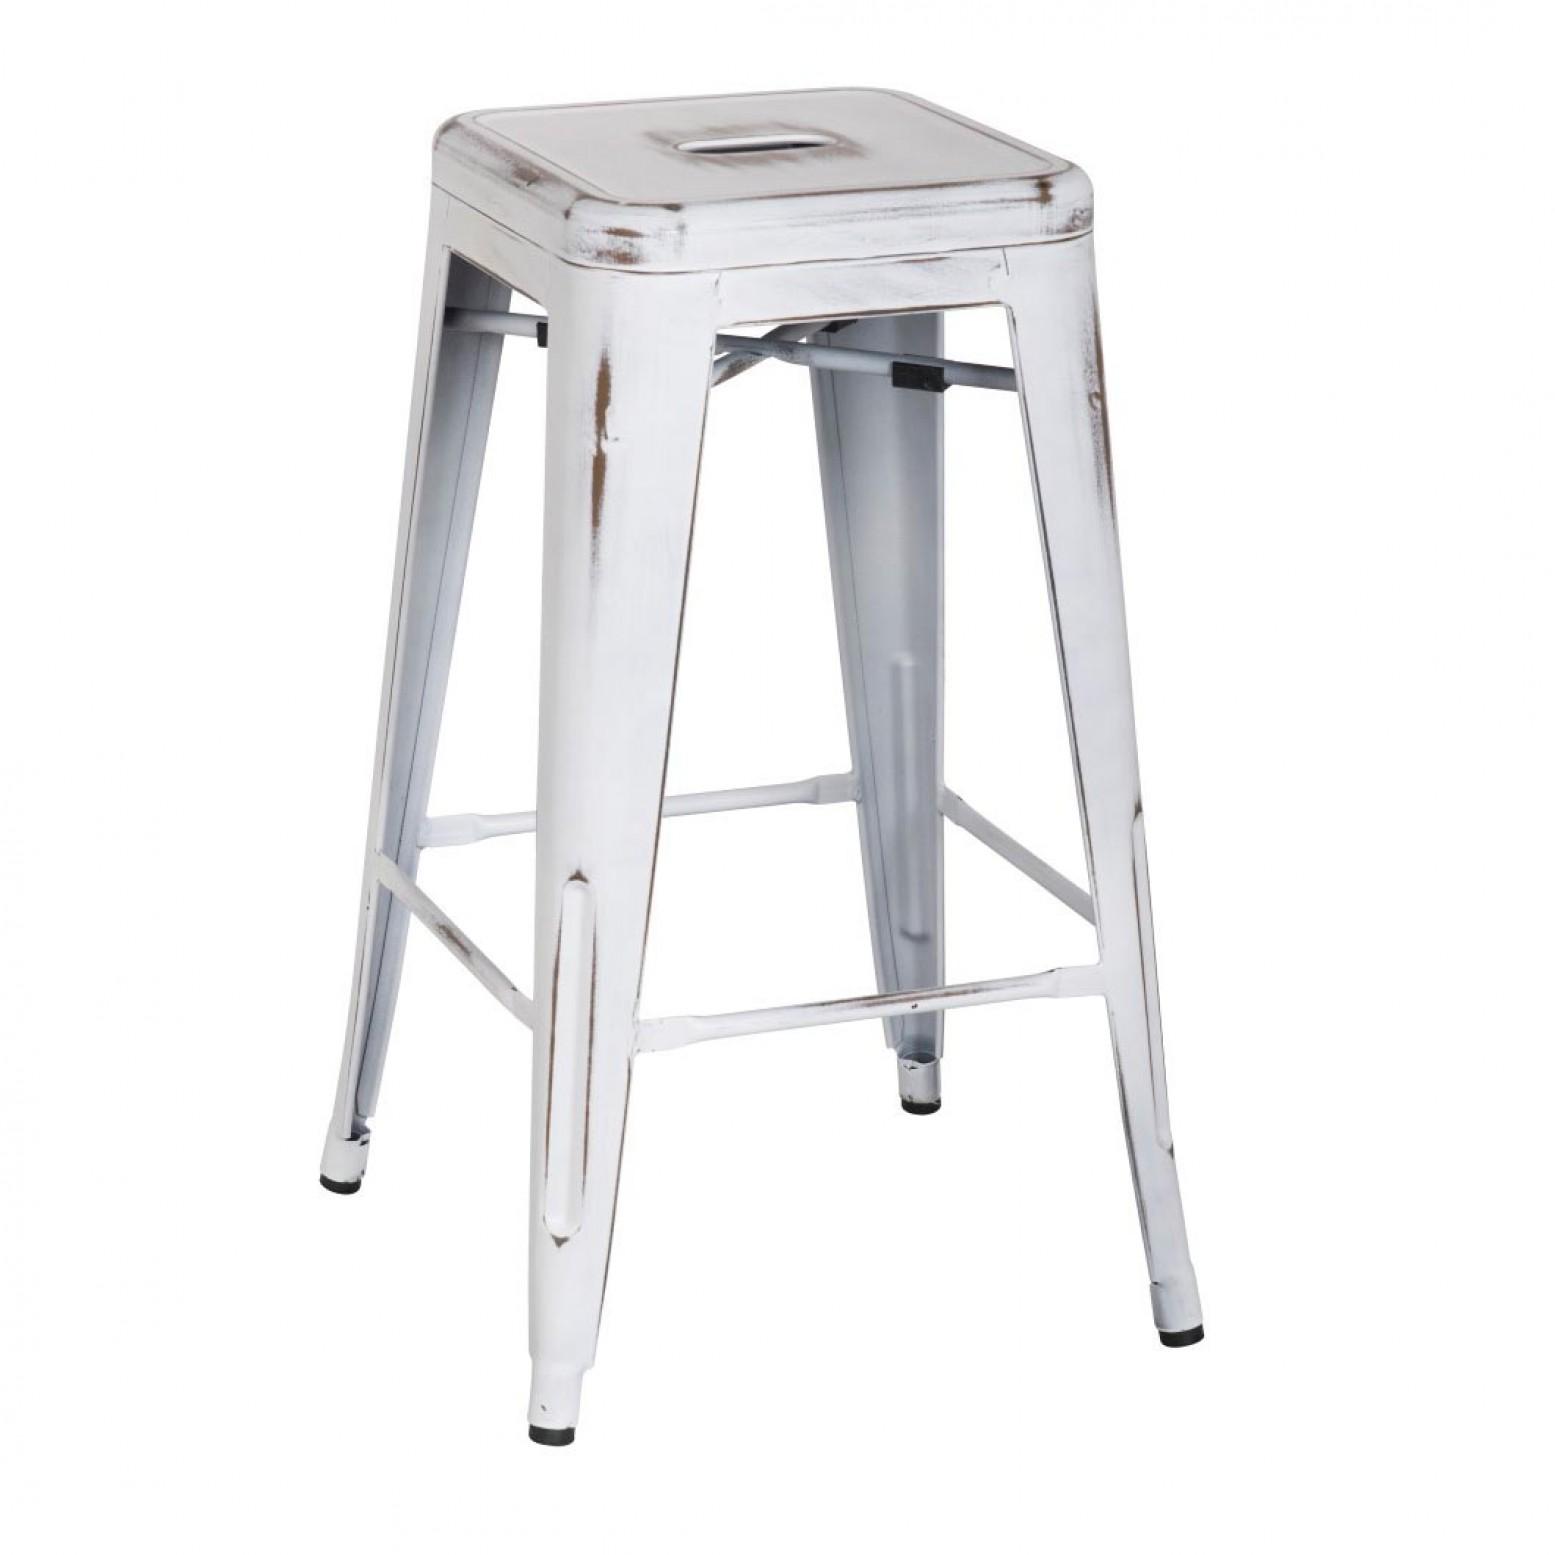 Magnificent Metropolis Metal Backless Counter Stool Distressed White Creativecarmelina Interior Chair Design Creativecarmelinacom